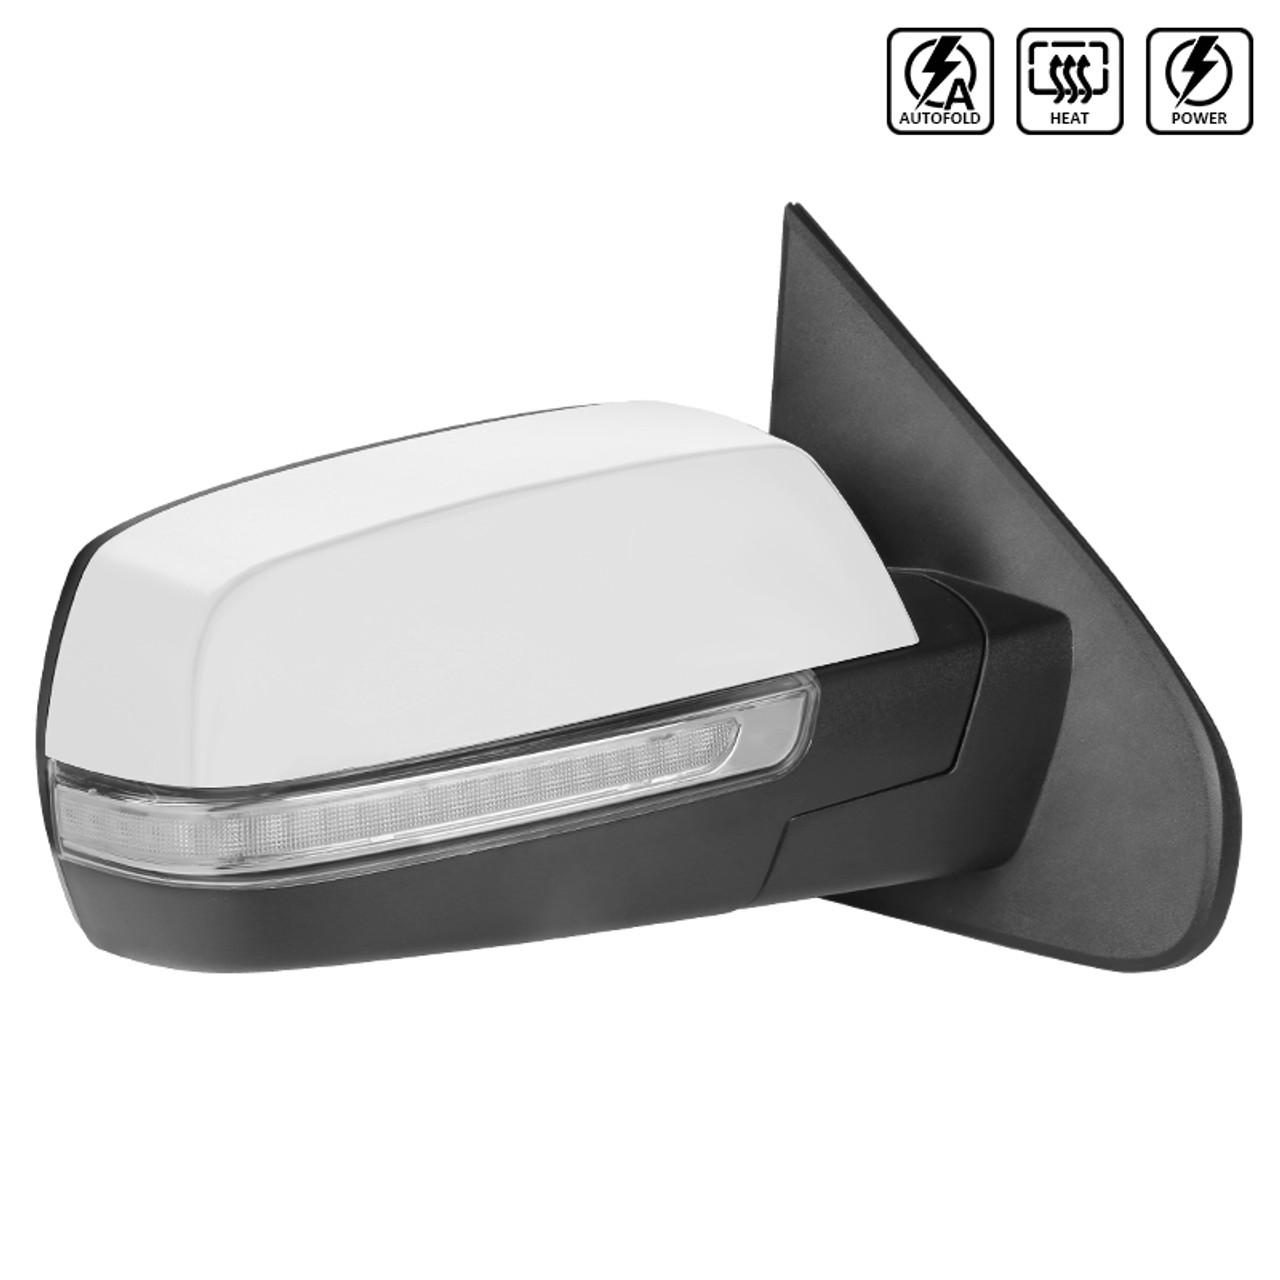 For 2014-2018 Chevrolet Silverado Glossy Black 2pcs Mirror Cap Covers Tape On